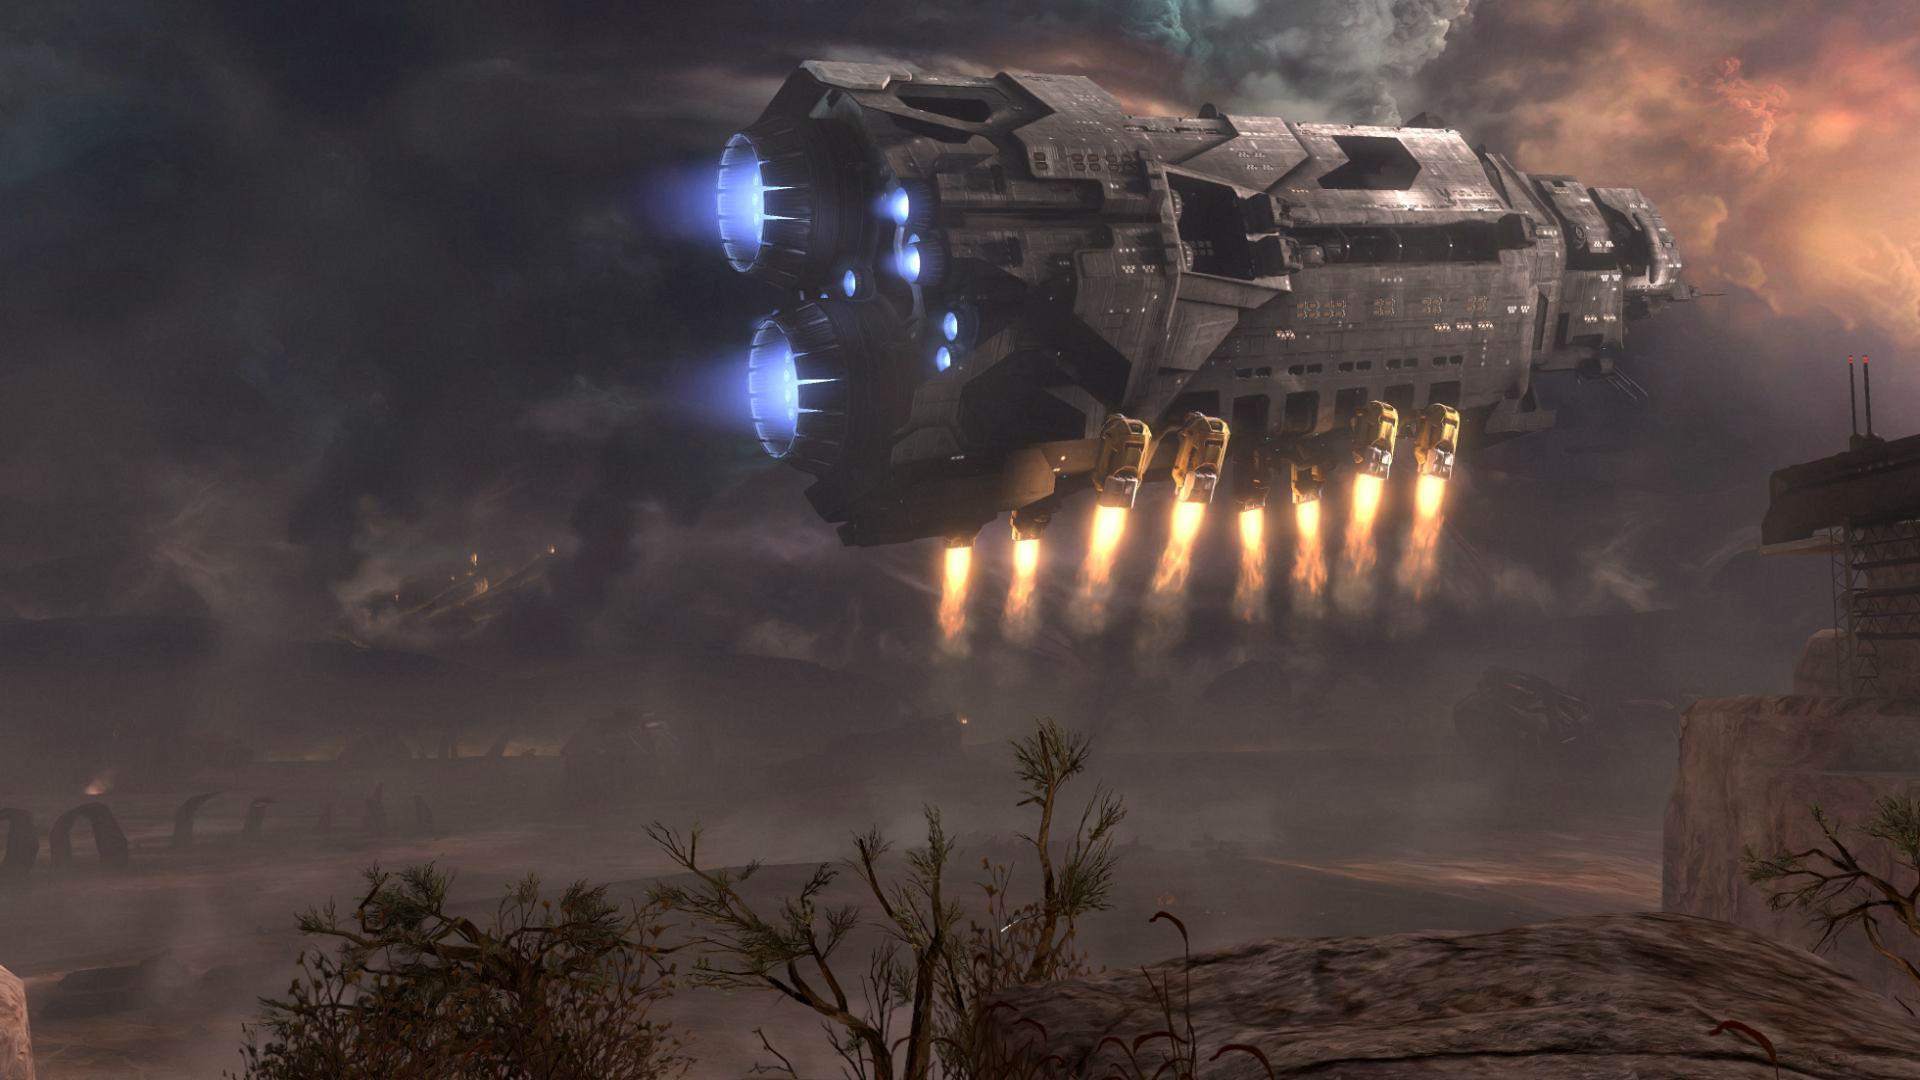 Video Game – Halo UNSC Pillar of Autumn Wallpaper